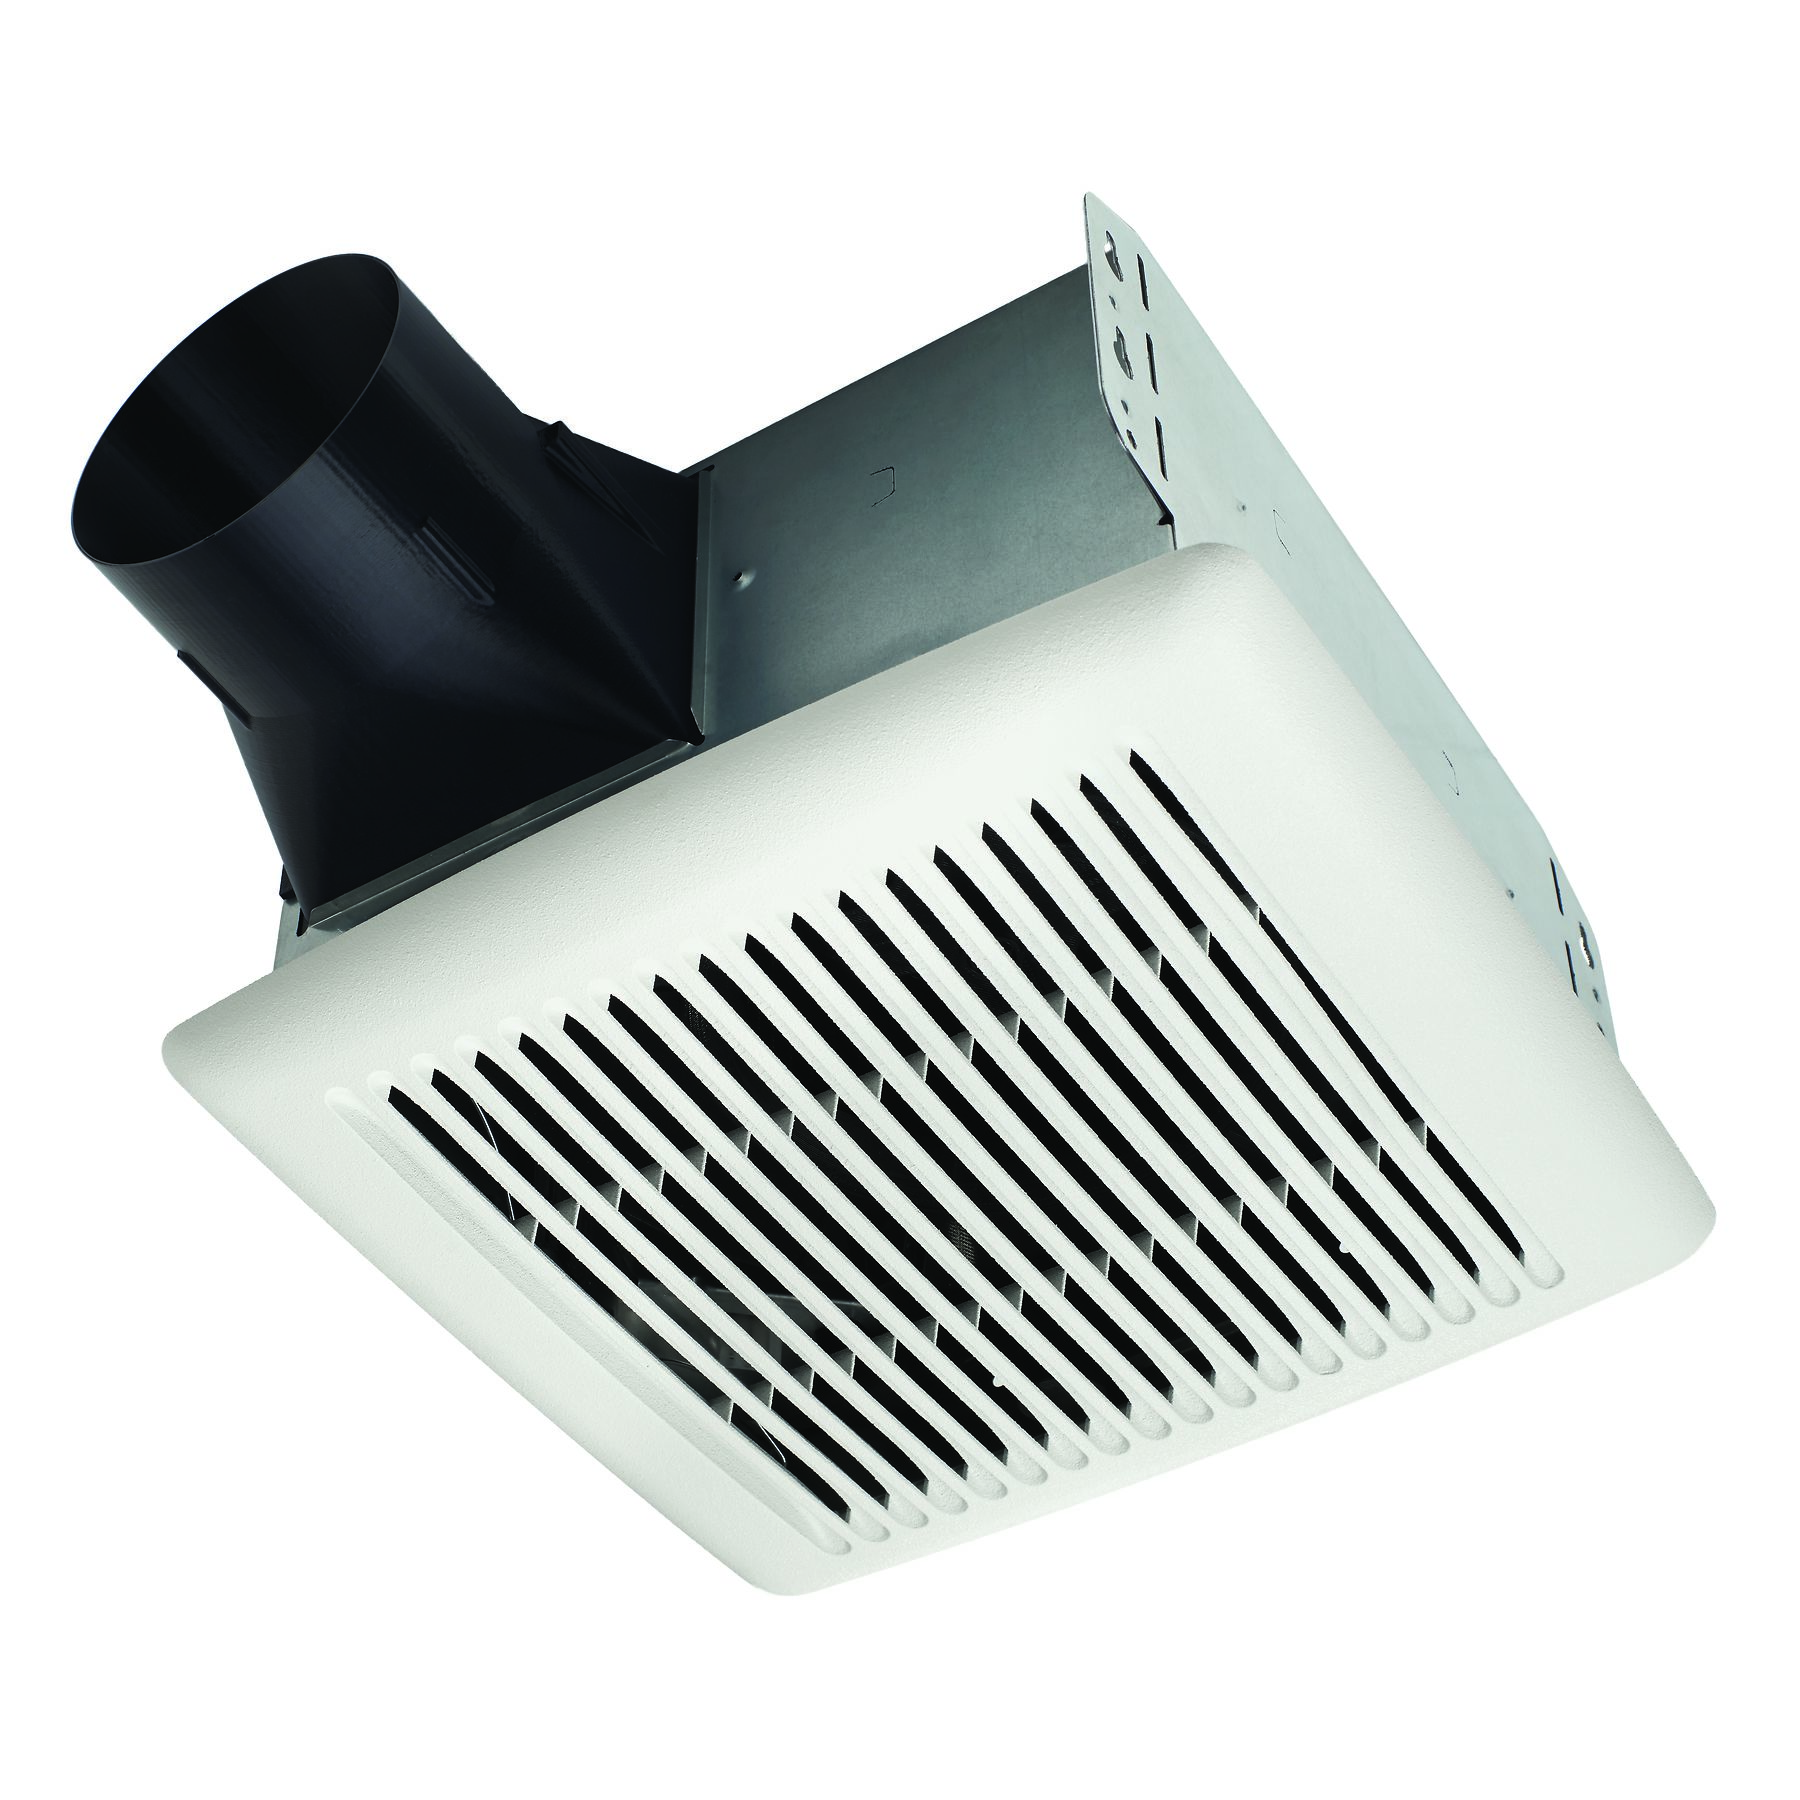 Ae50110dc Broan Bathroom Exhaust Fan, Bathroom Exhaust Fan Cfm